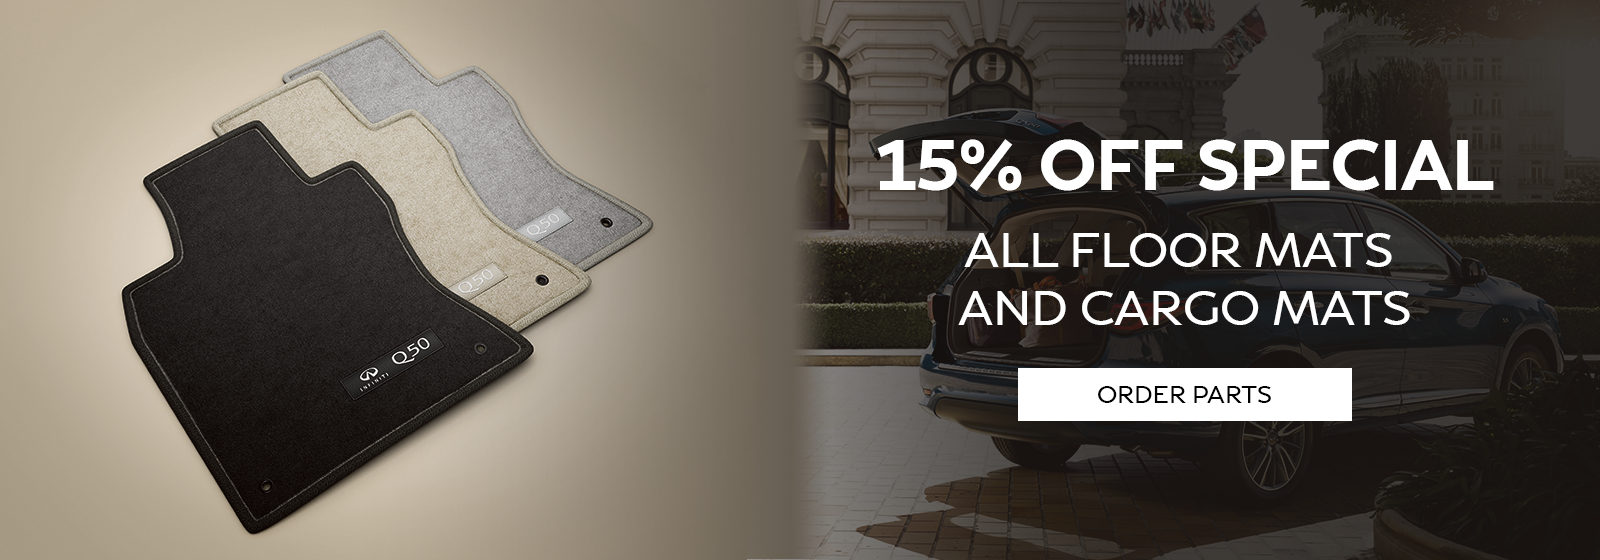 15% Off Special All Floor Mats & Cargo Mats